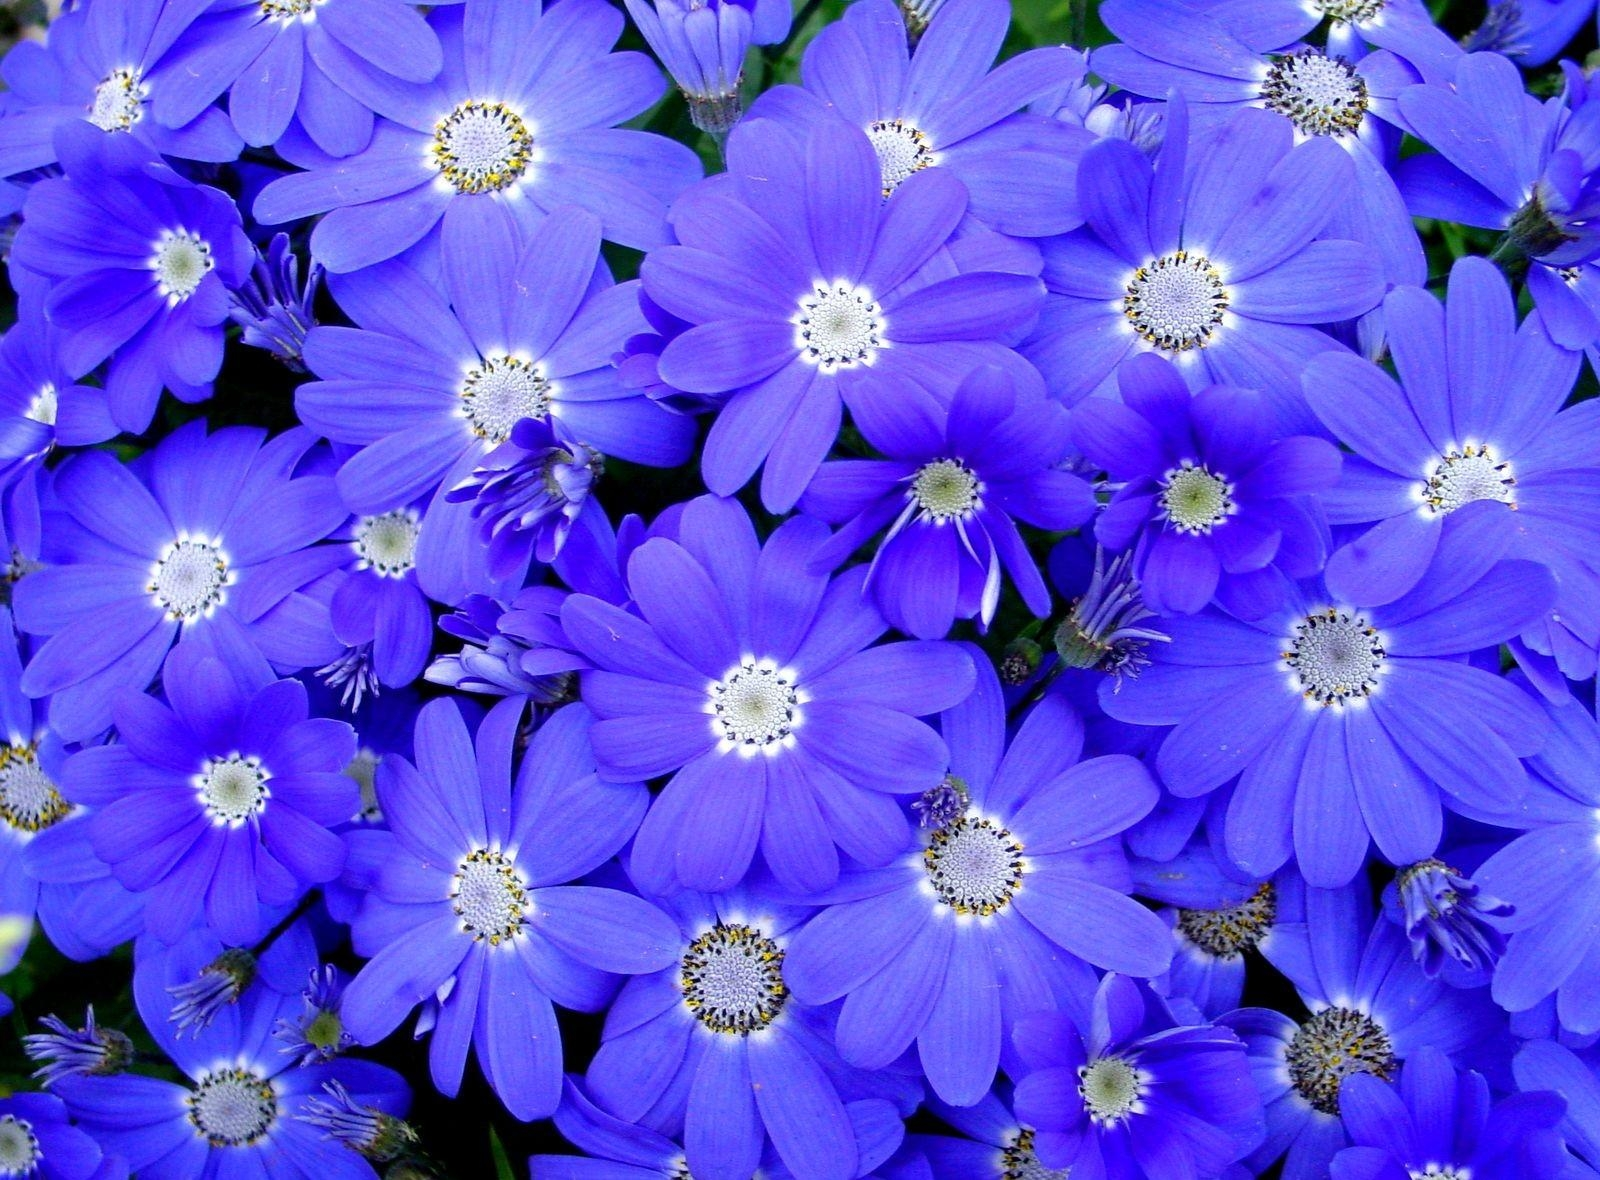 91938 descargar fondo de pantalla Flores, Brillante, Pétalos, Vistoso, Cineraria, De Color: protectores de pantalla e imágenes gratis